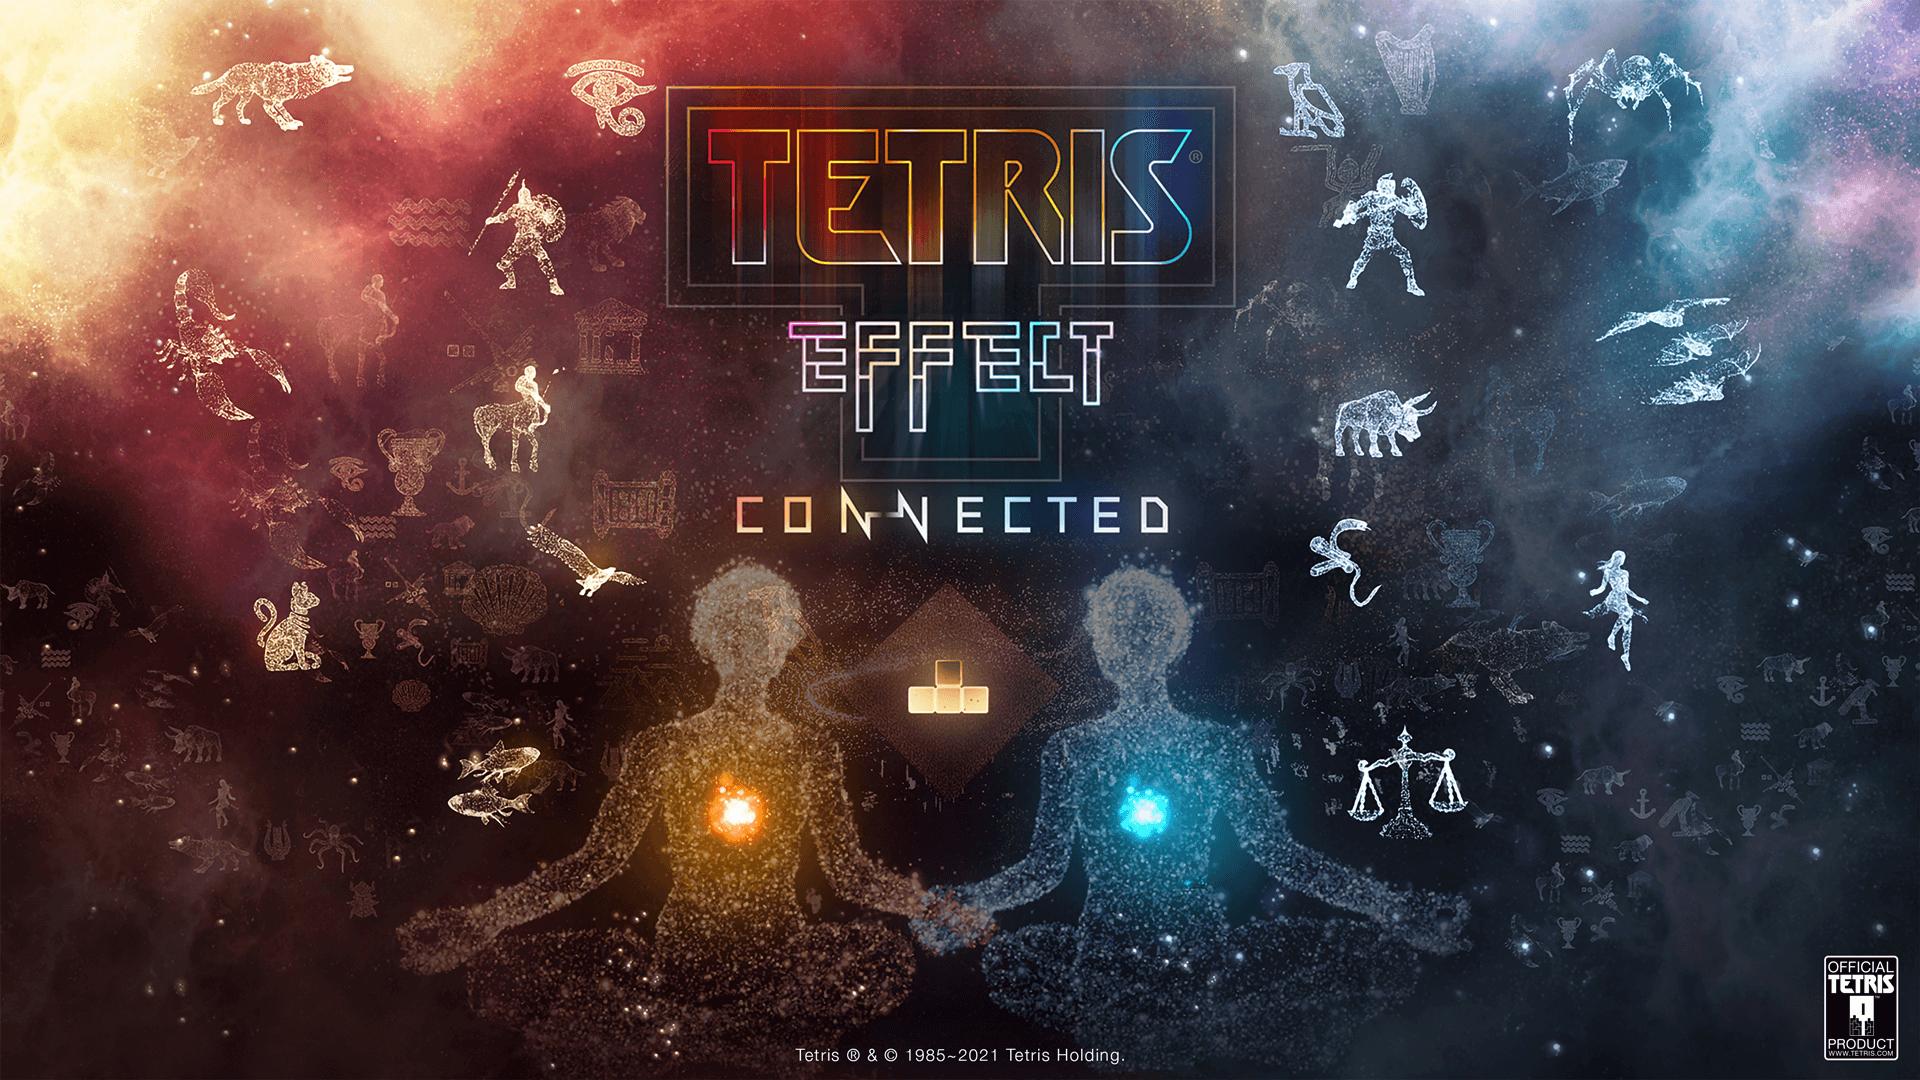 tetriseffectconnected_keyart_1080p